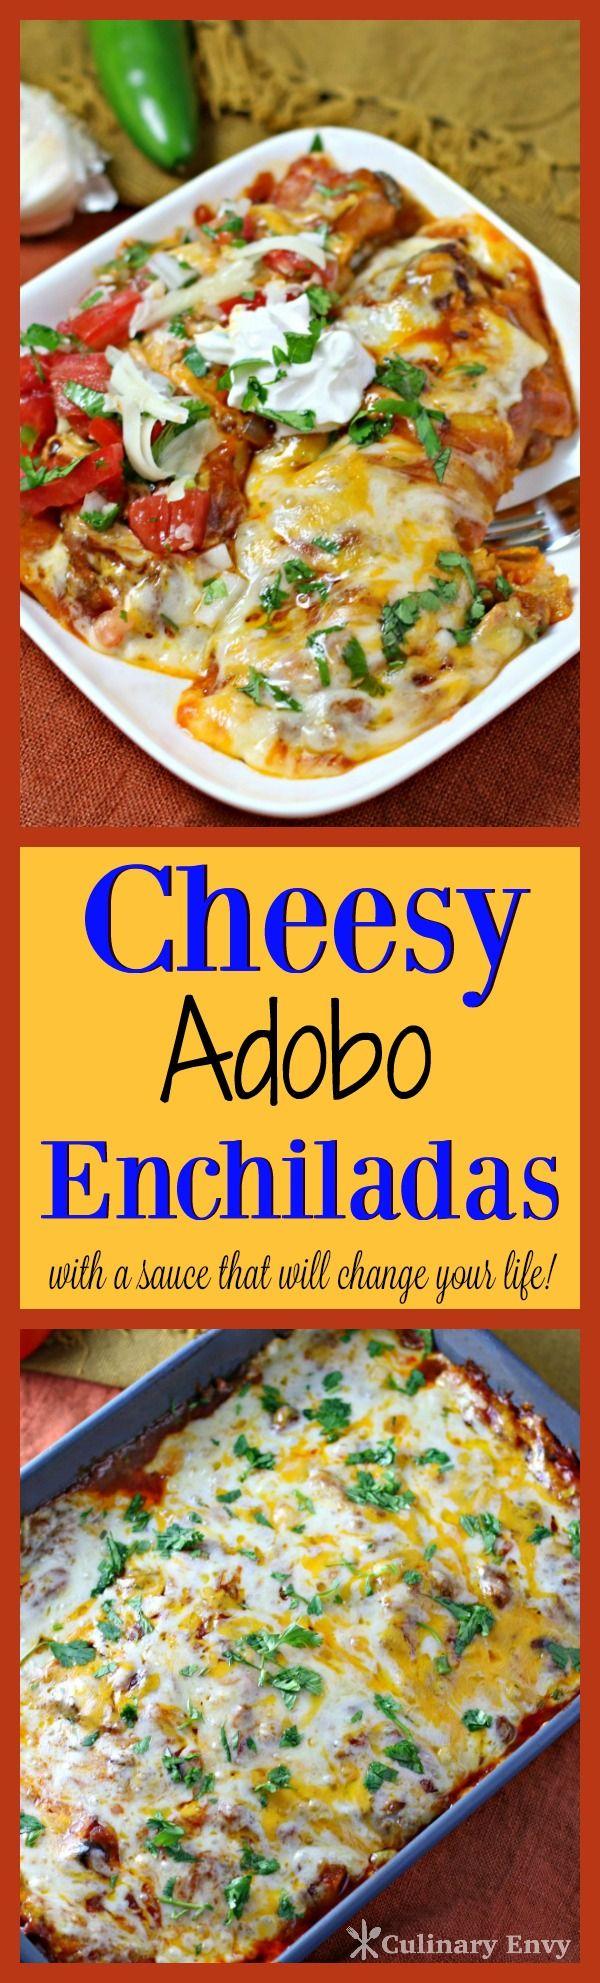 Cheesy Adobo Enchiladas